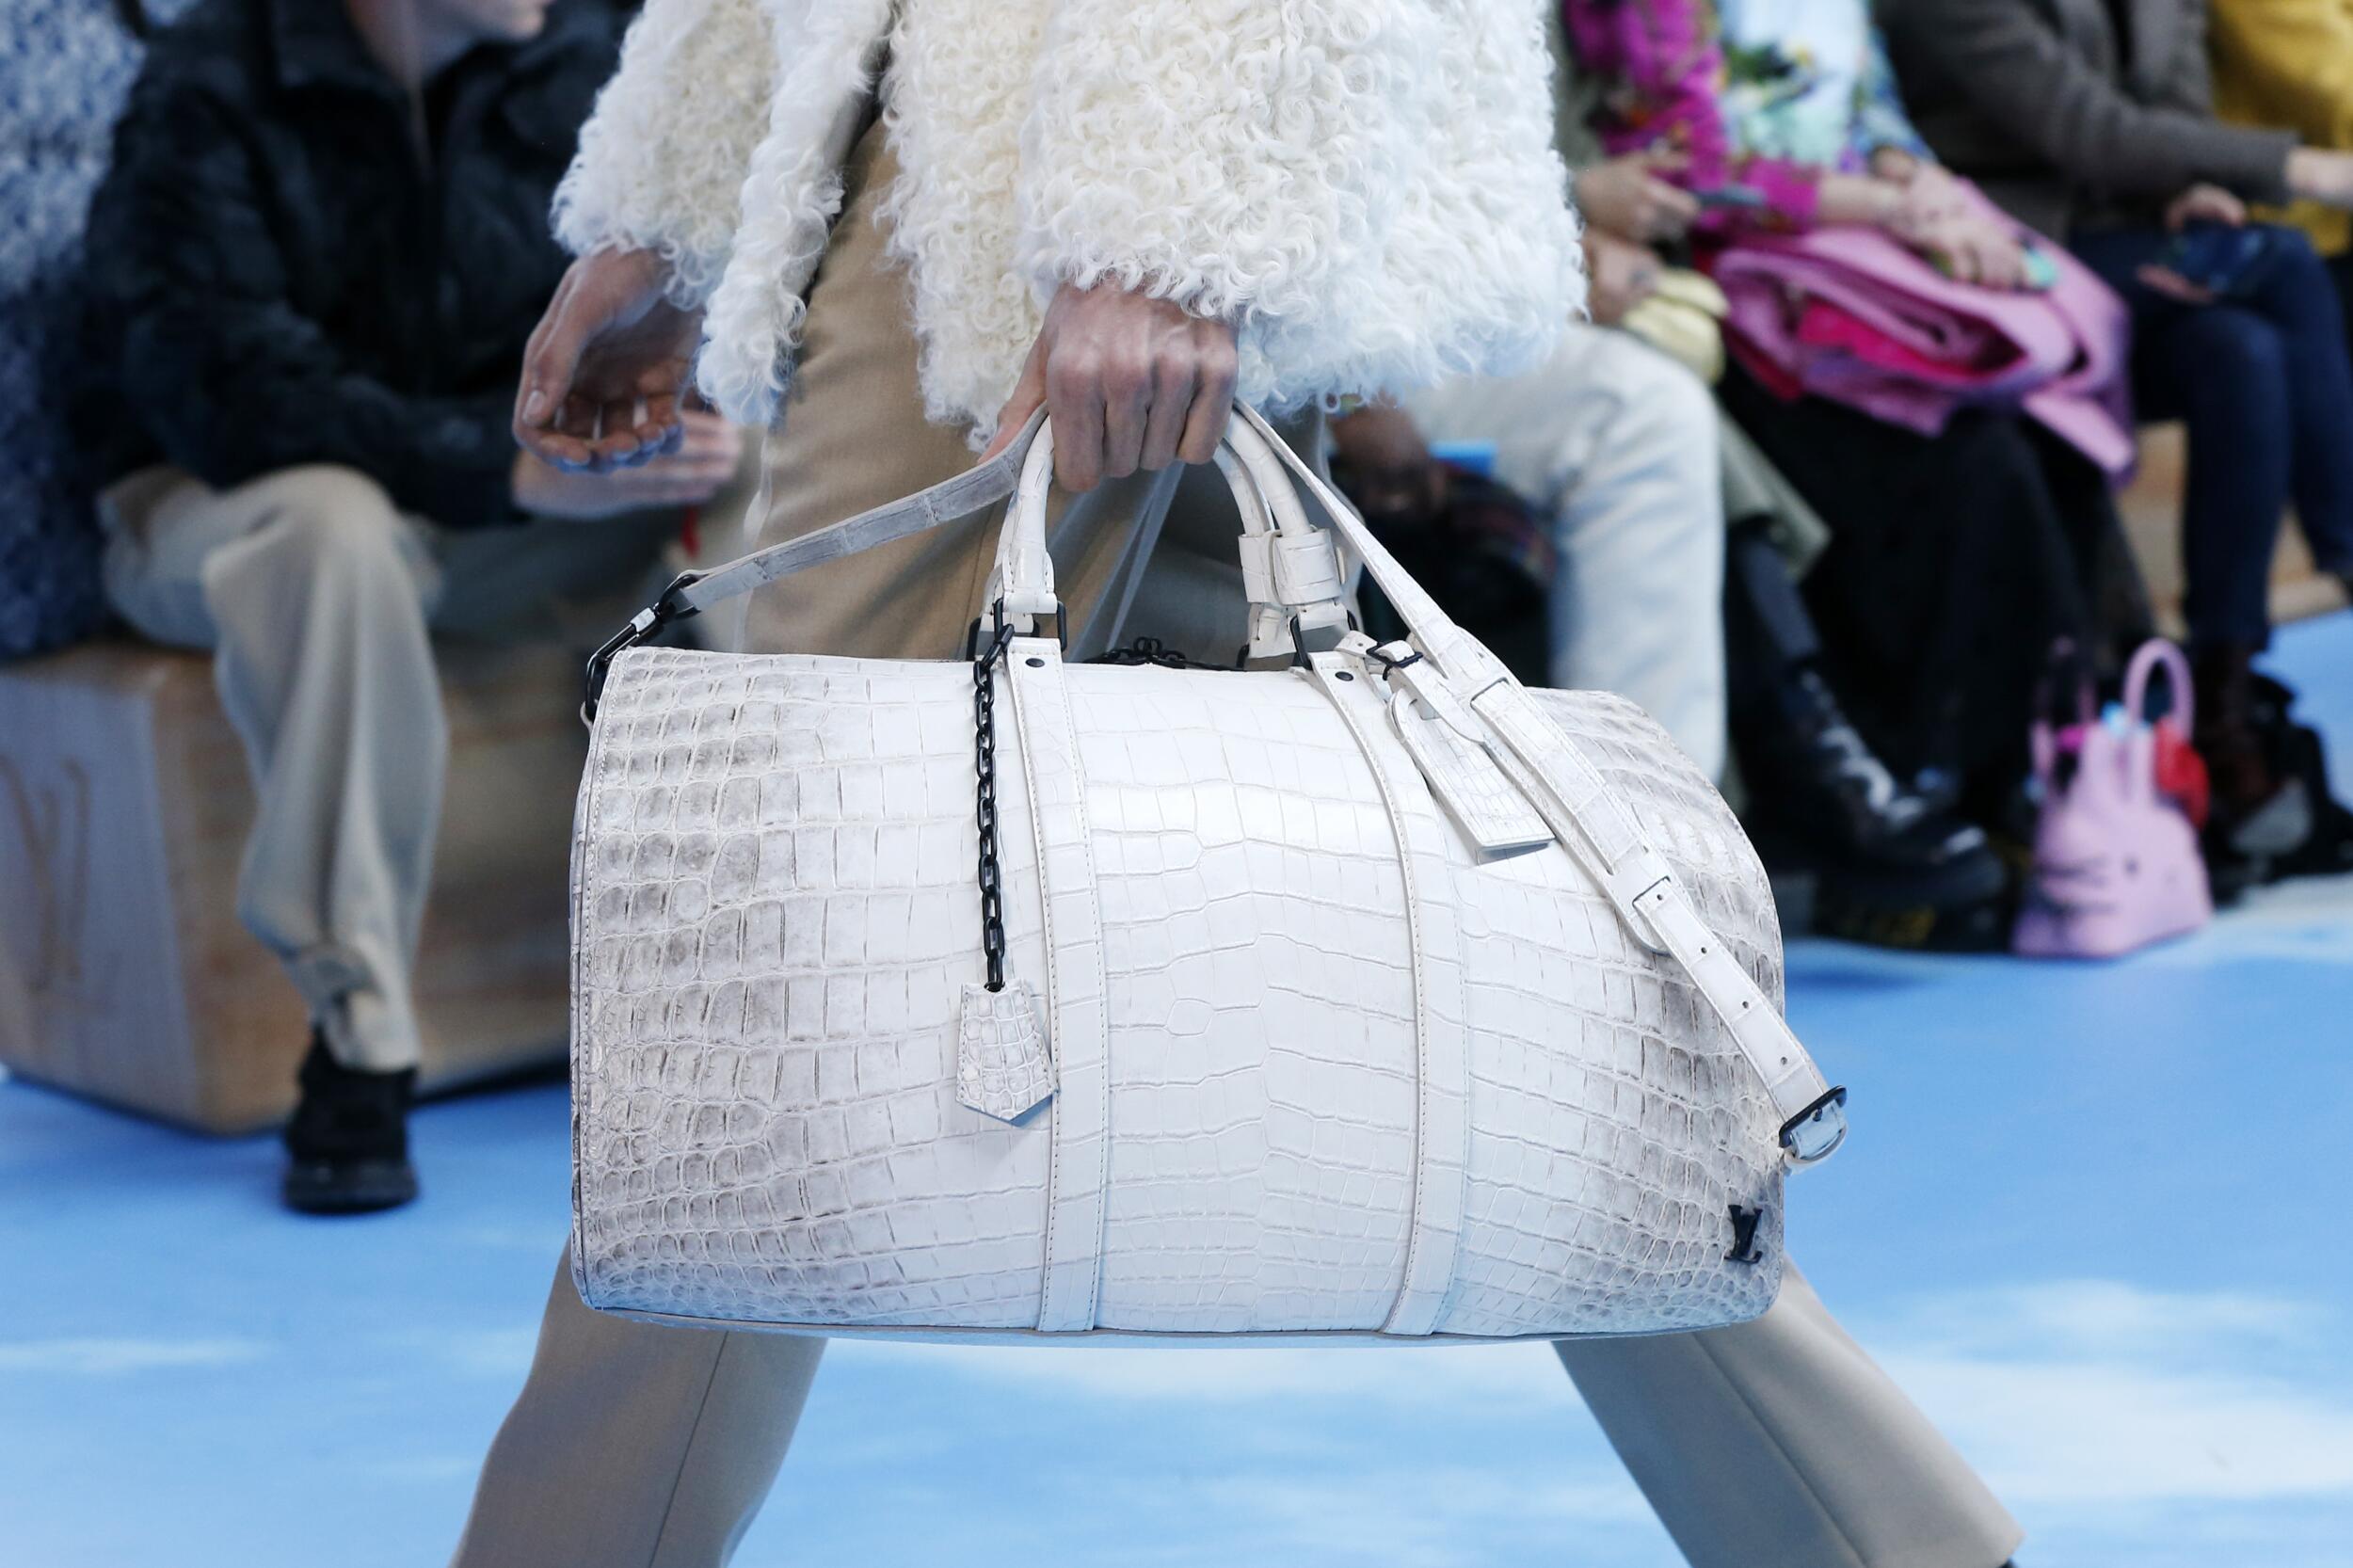 Louis Vuitton Menswear Handbag 2020-21